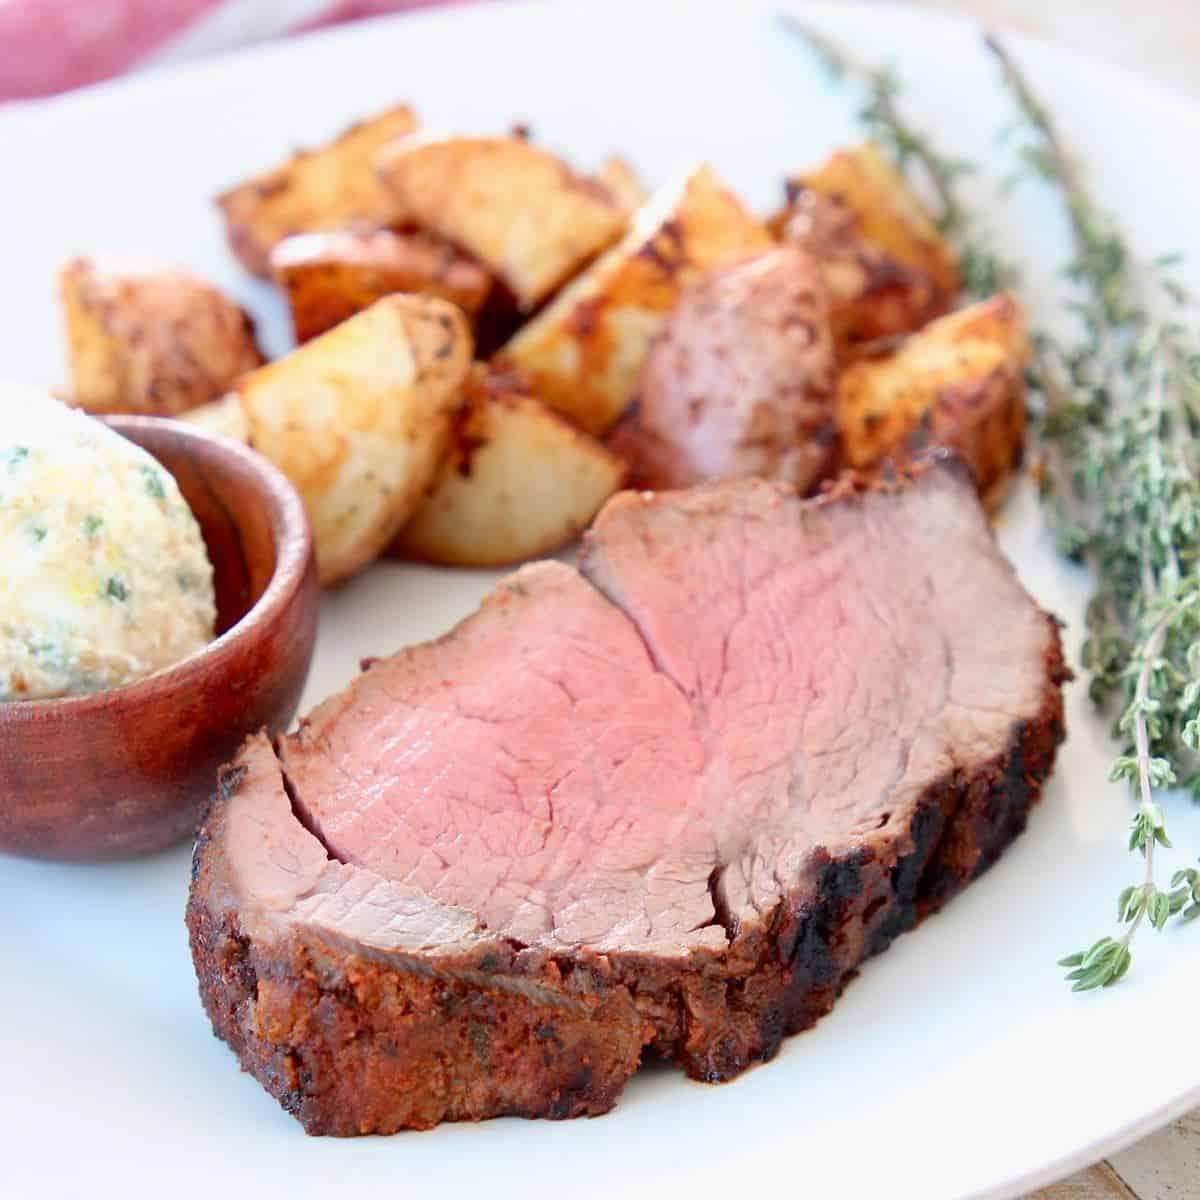 Slice of blackened beef tenderloin on plate with potatoes and herb butter in wood ramekin